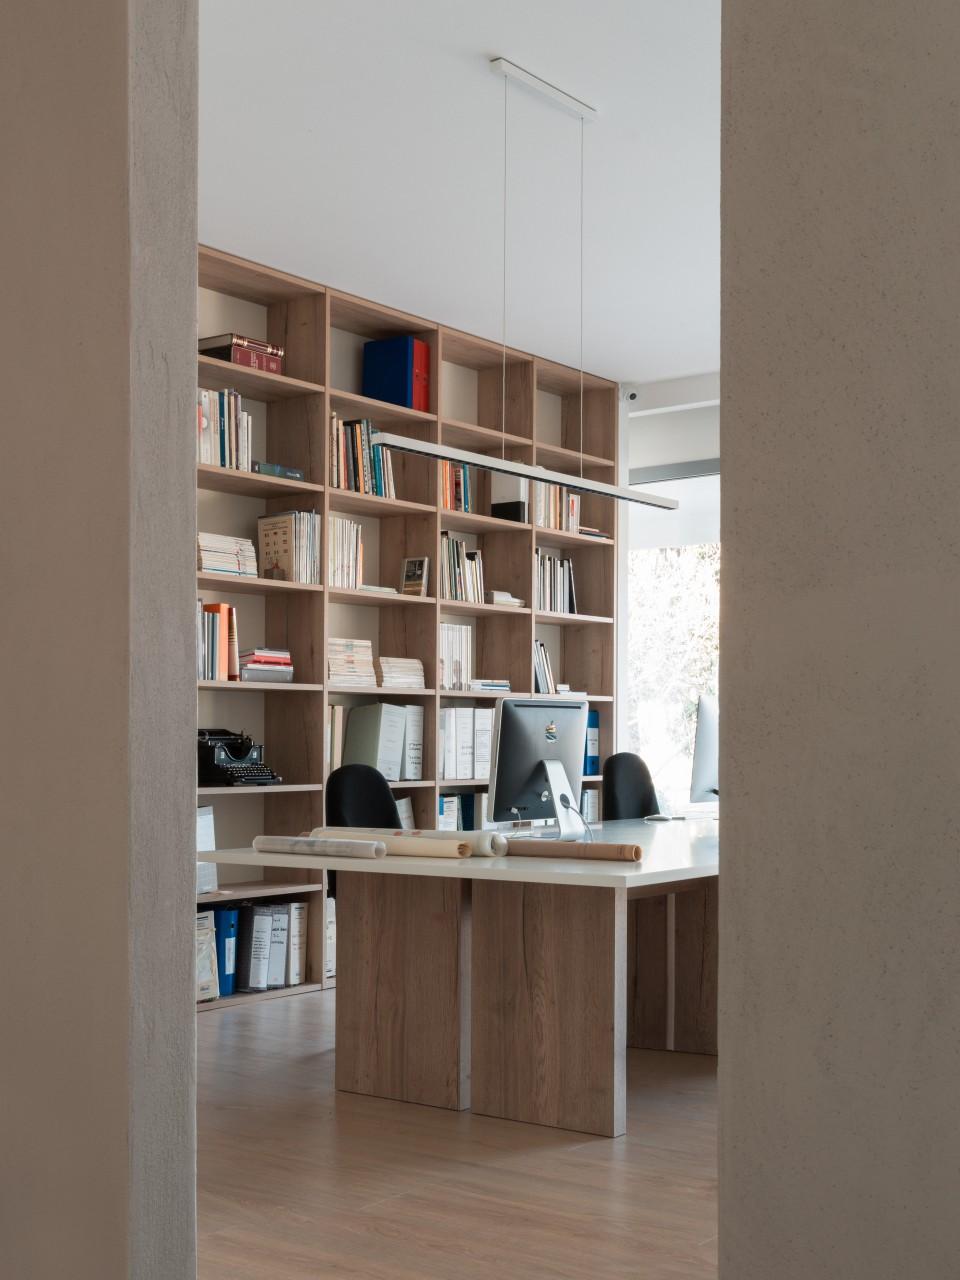 studio-architettura-tommasi-designlifestyle-1+